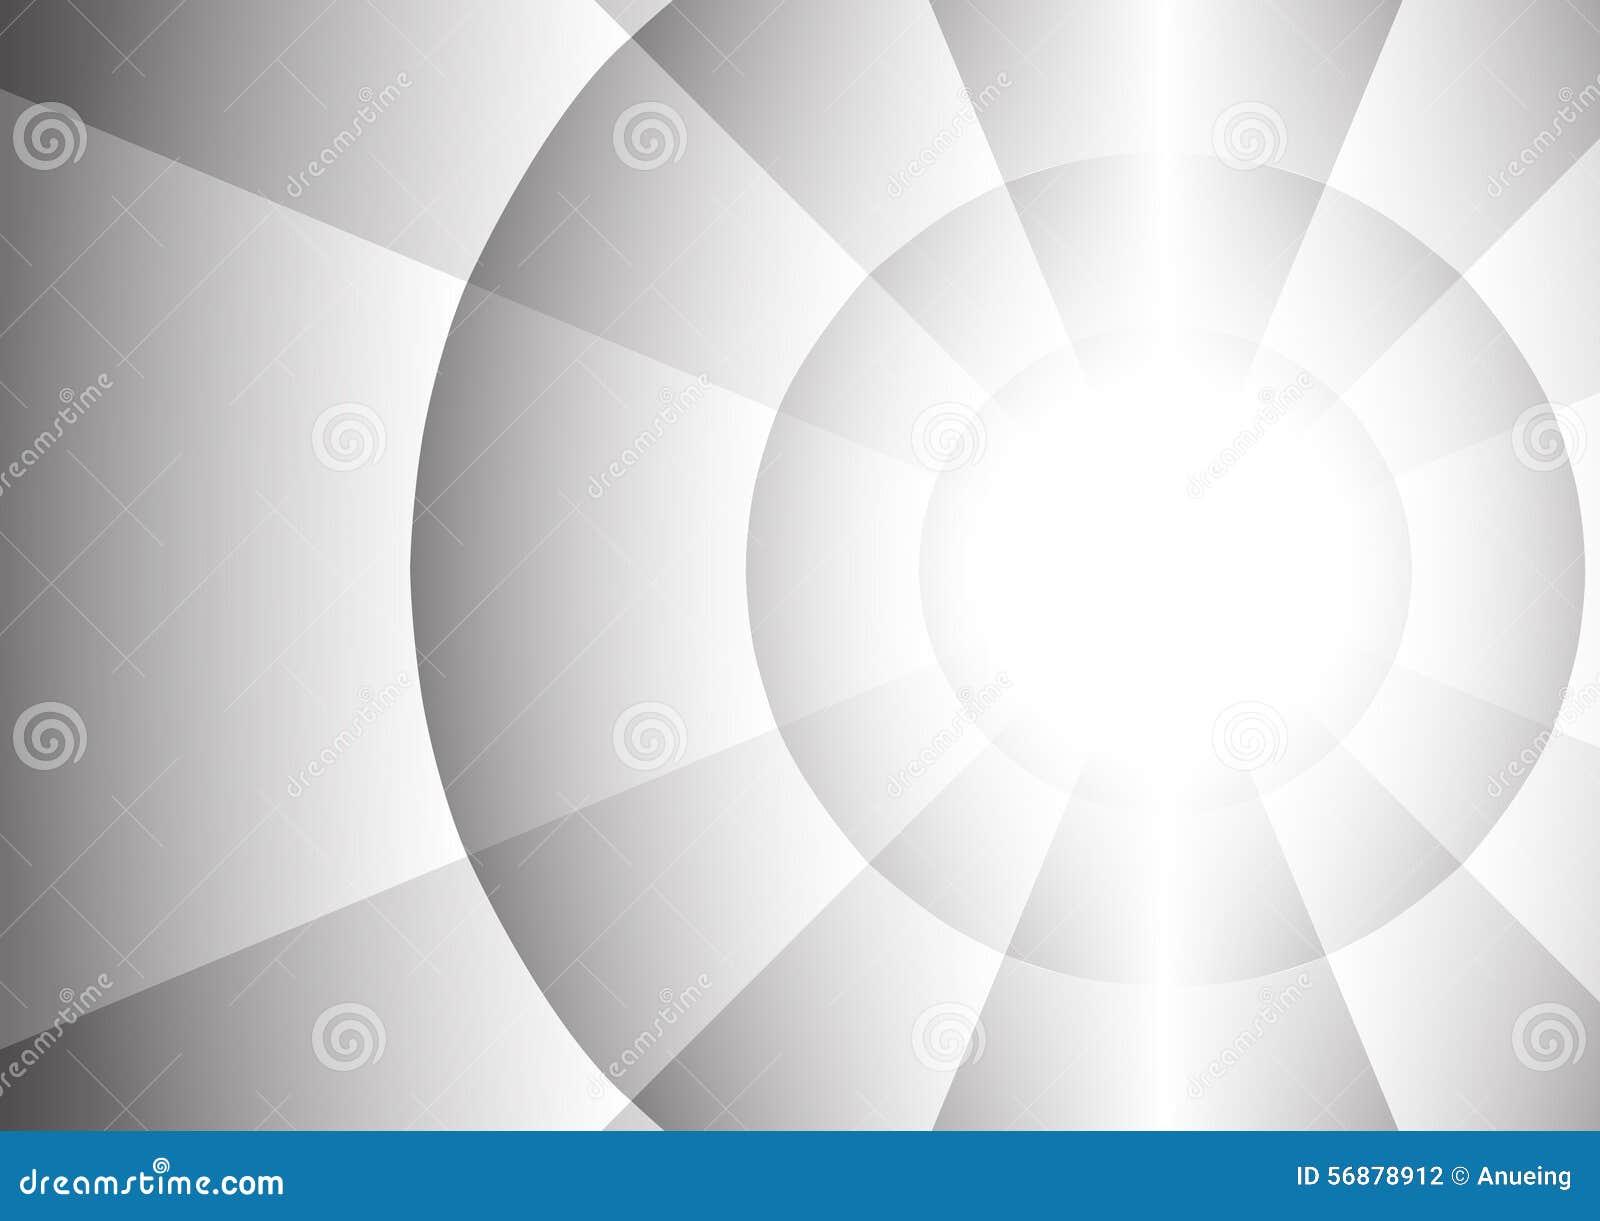 Abstrakt radie av cirkelbakgrund